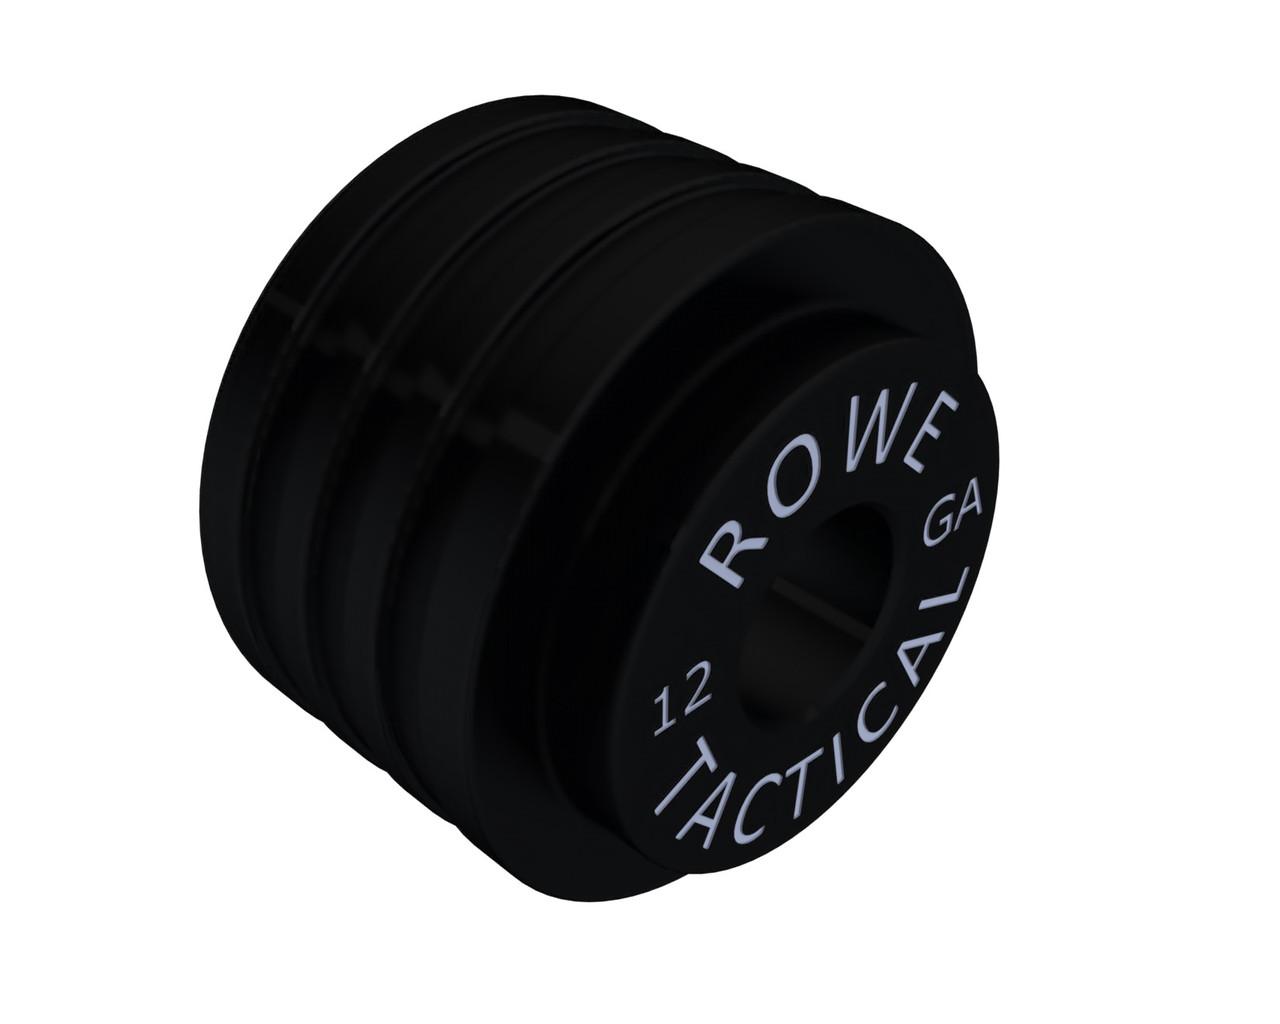 Rowe Tactical Mossberg 500 590 Shotgun Magazine Follower 12ga Low-Drag - Black